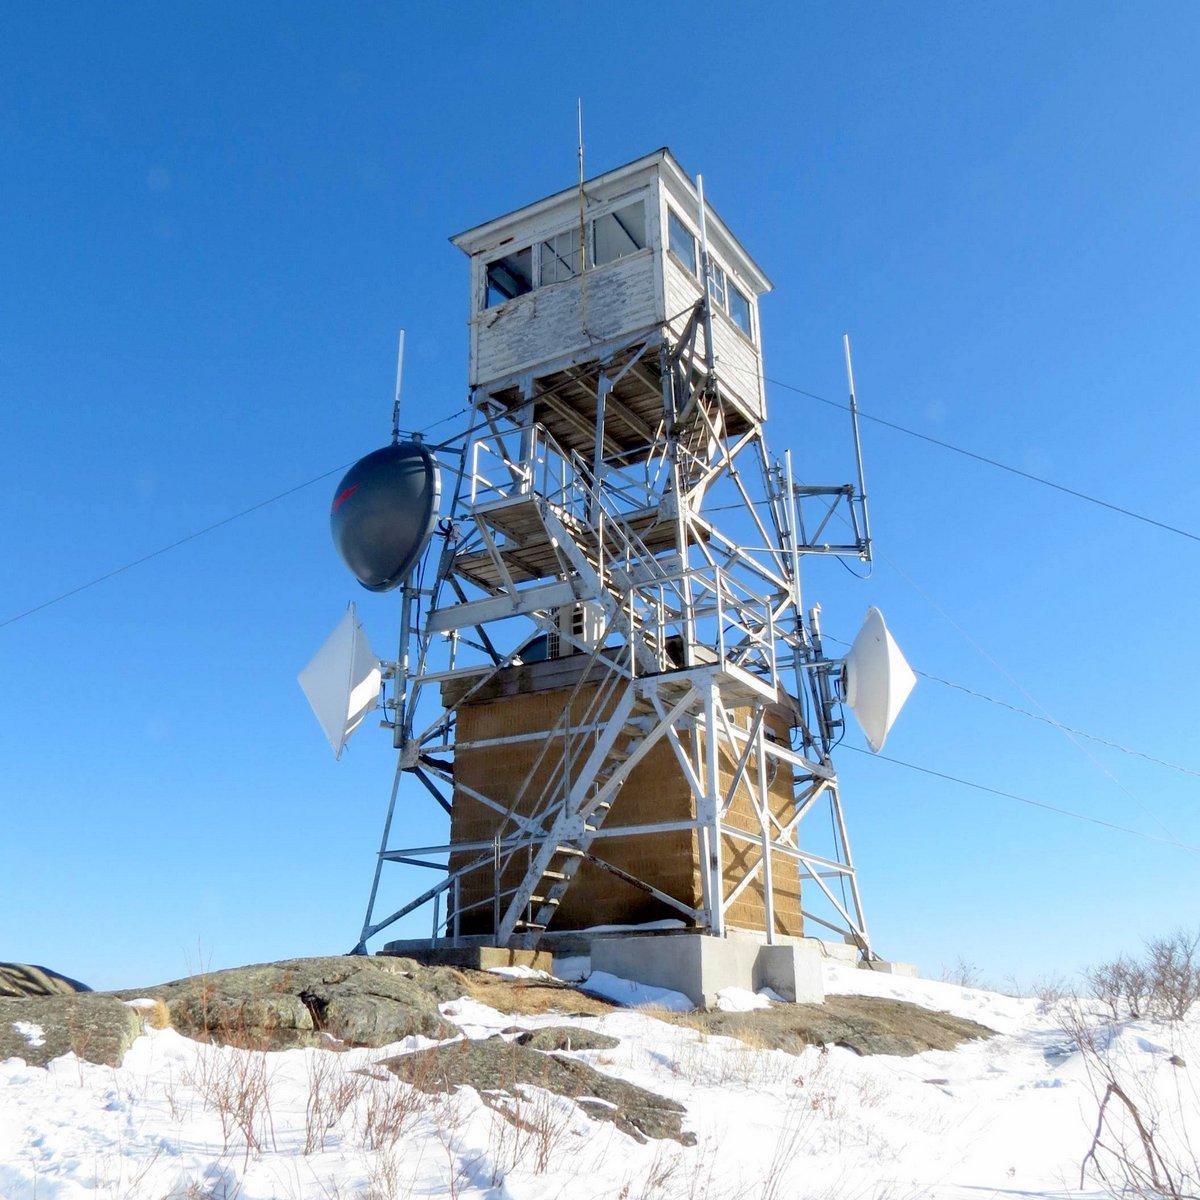 9. Fire Tower